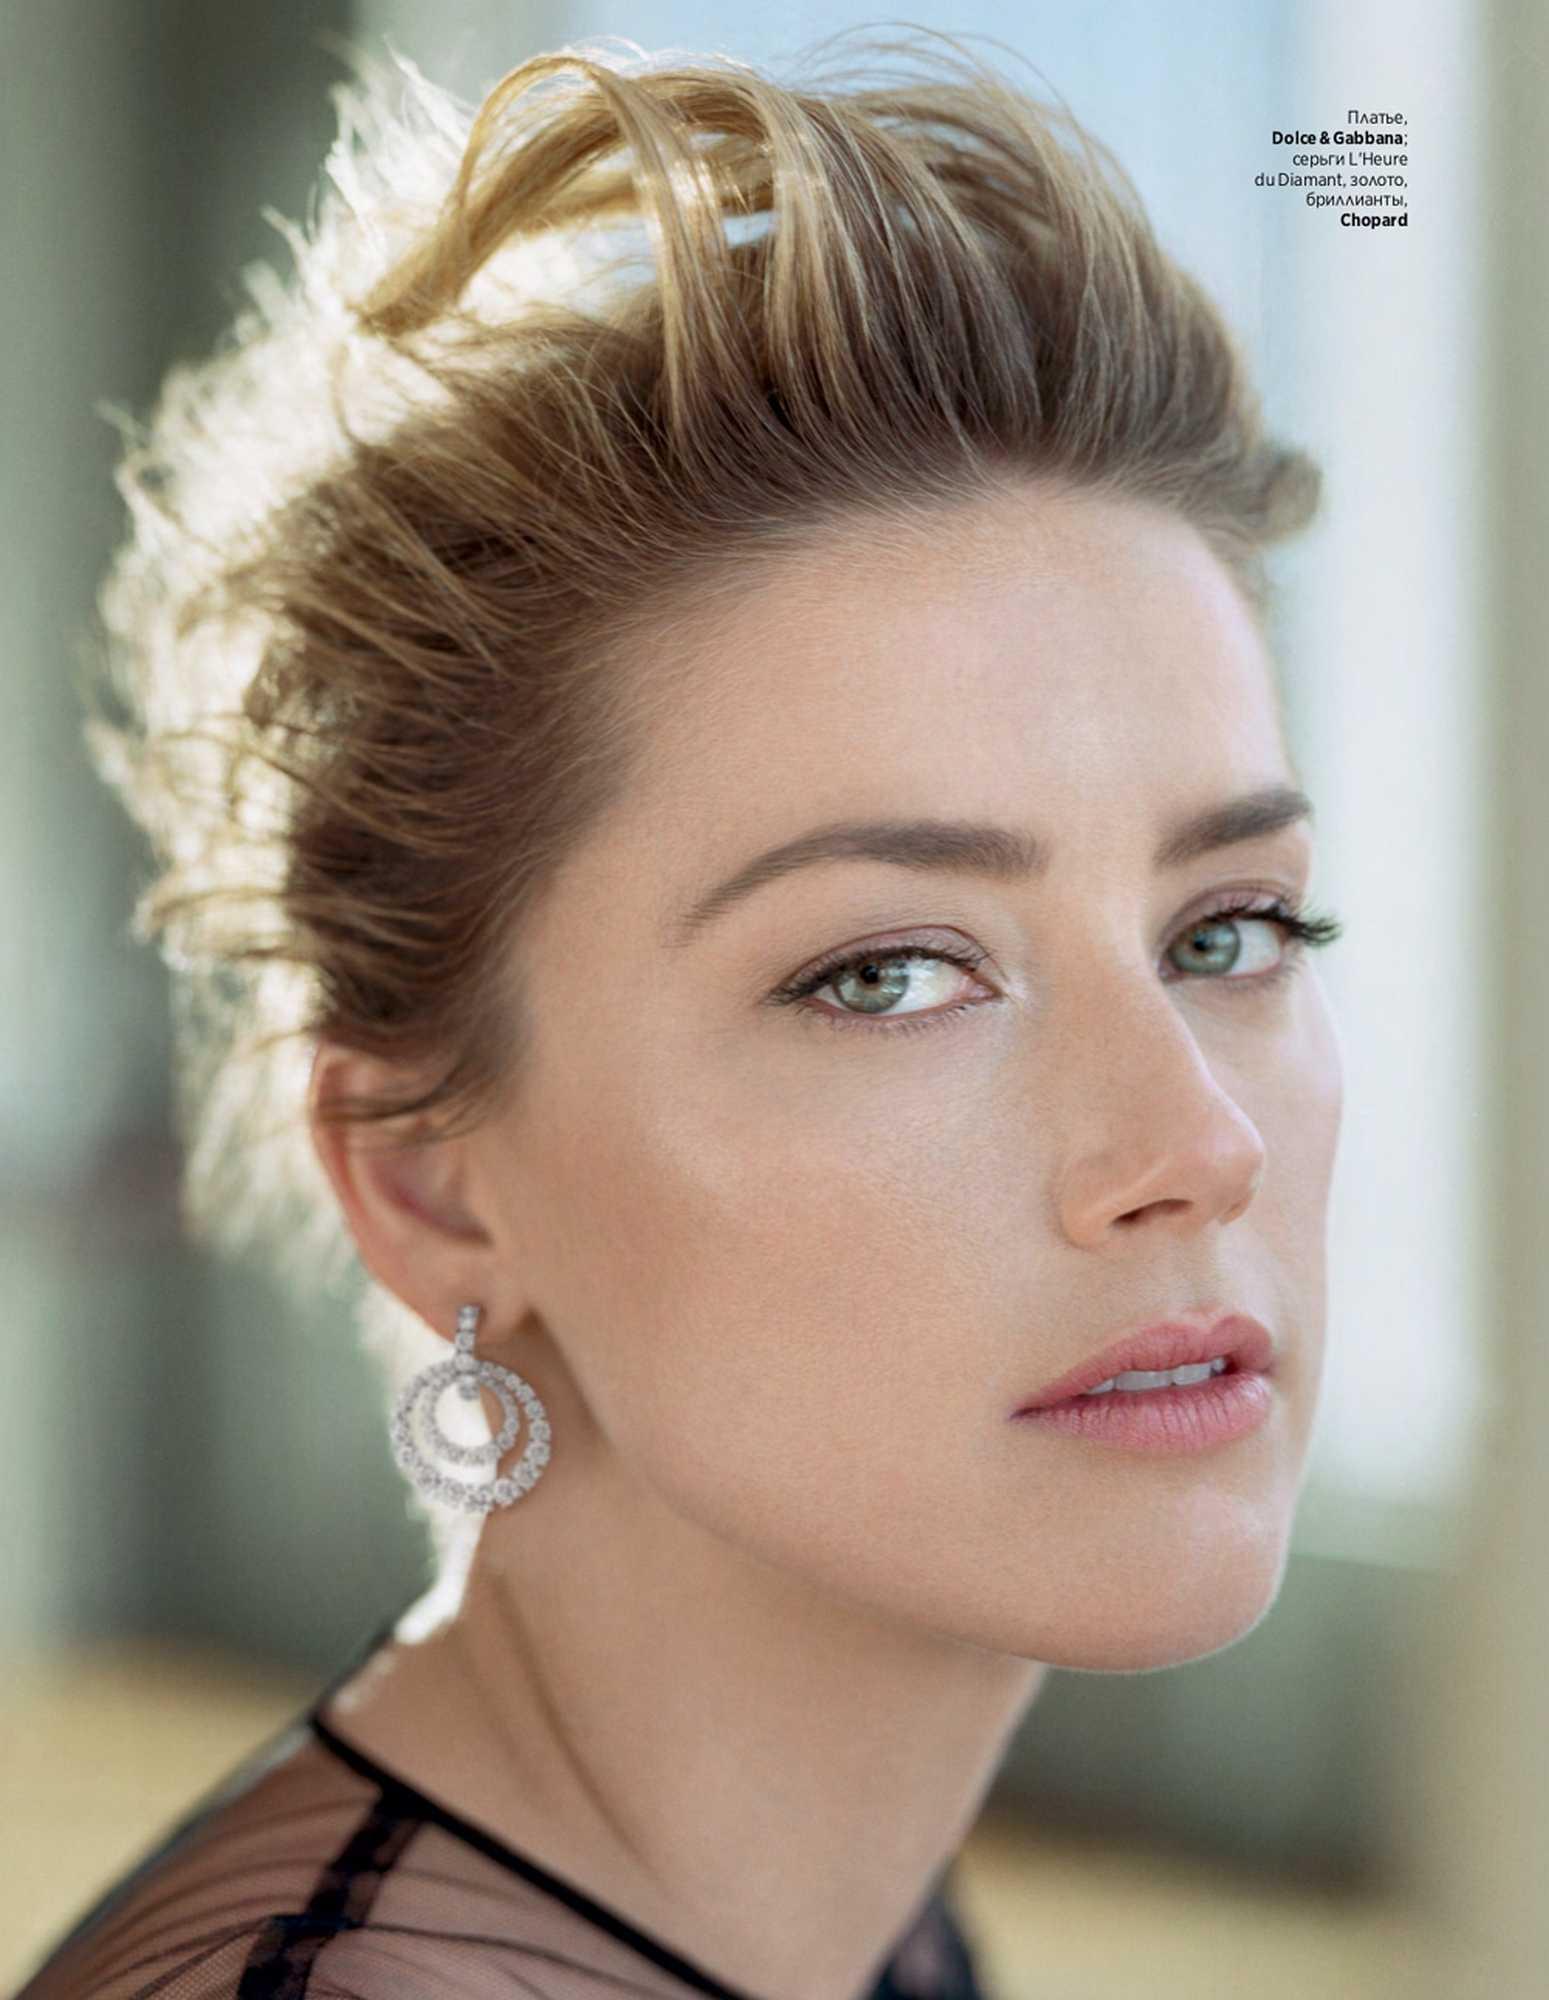 Amber-Heard-InStyle-Russia-December-20187.jpg